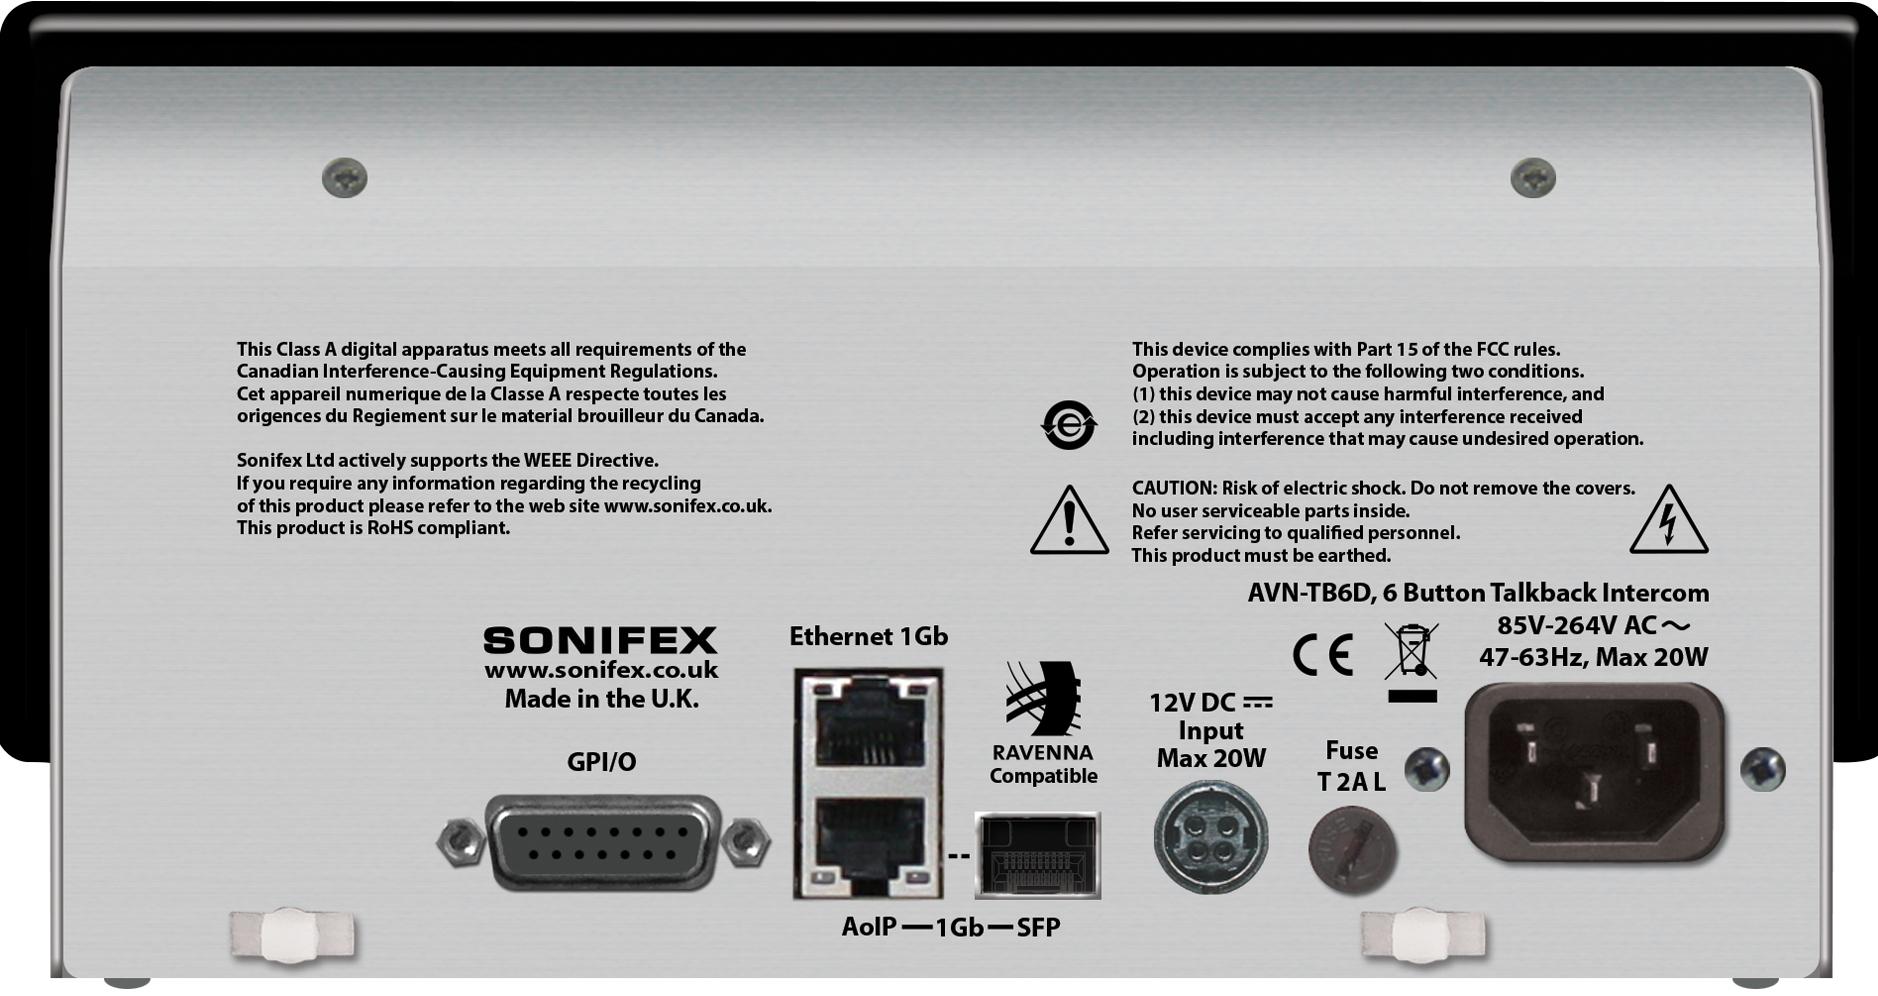 Sonifex Catalogues Handbooks Logos Images Open Electrical Panels Are Dangerous C Daniel Friedman Aoip